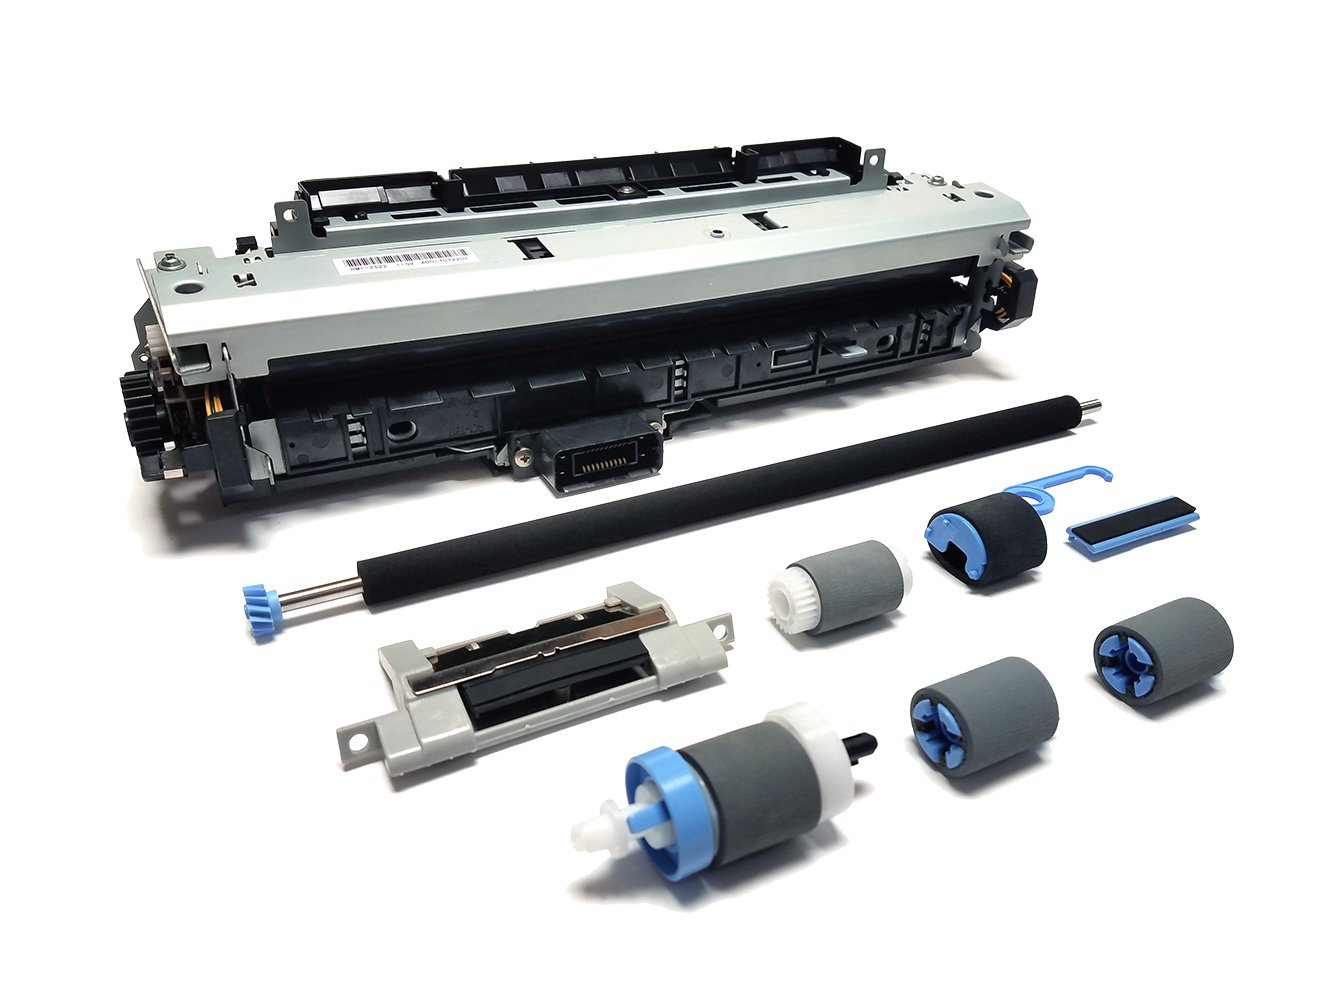 Altru Print Q7543-67909-MK-DLX-AP (Q7543A. RM1-2522) Deluxe Maintenance Kit for HP Laserjet 5200 (110V) Includes RM1-2522 Fuser, Transfer Roller & Tray 1-3 Rollers by Altru Print